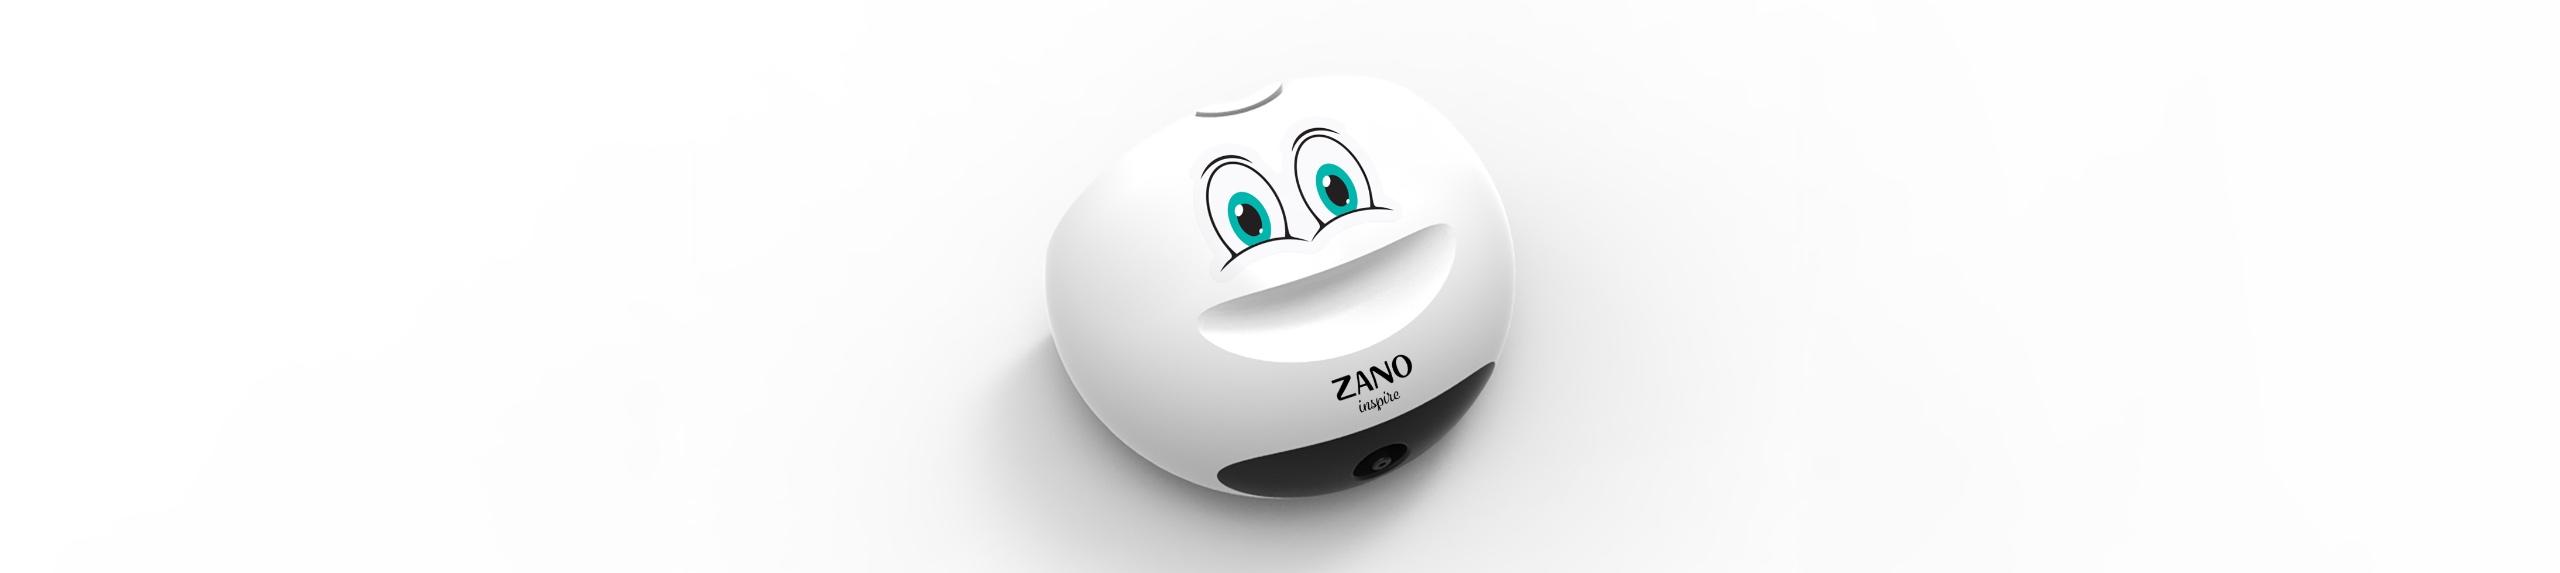 P3-Slider-Img-Zano-Insp4